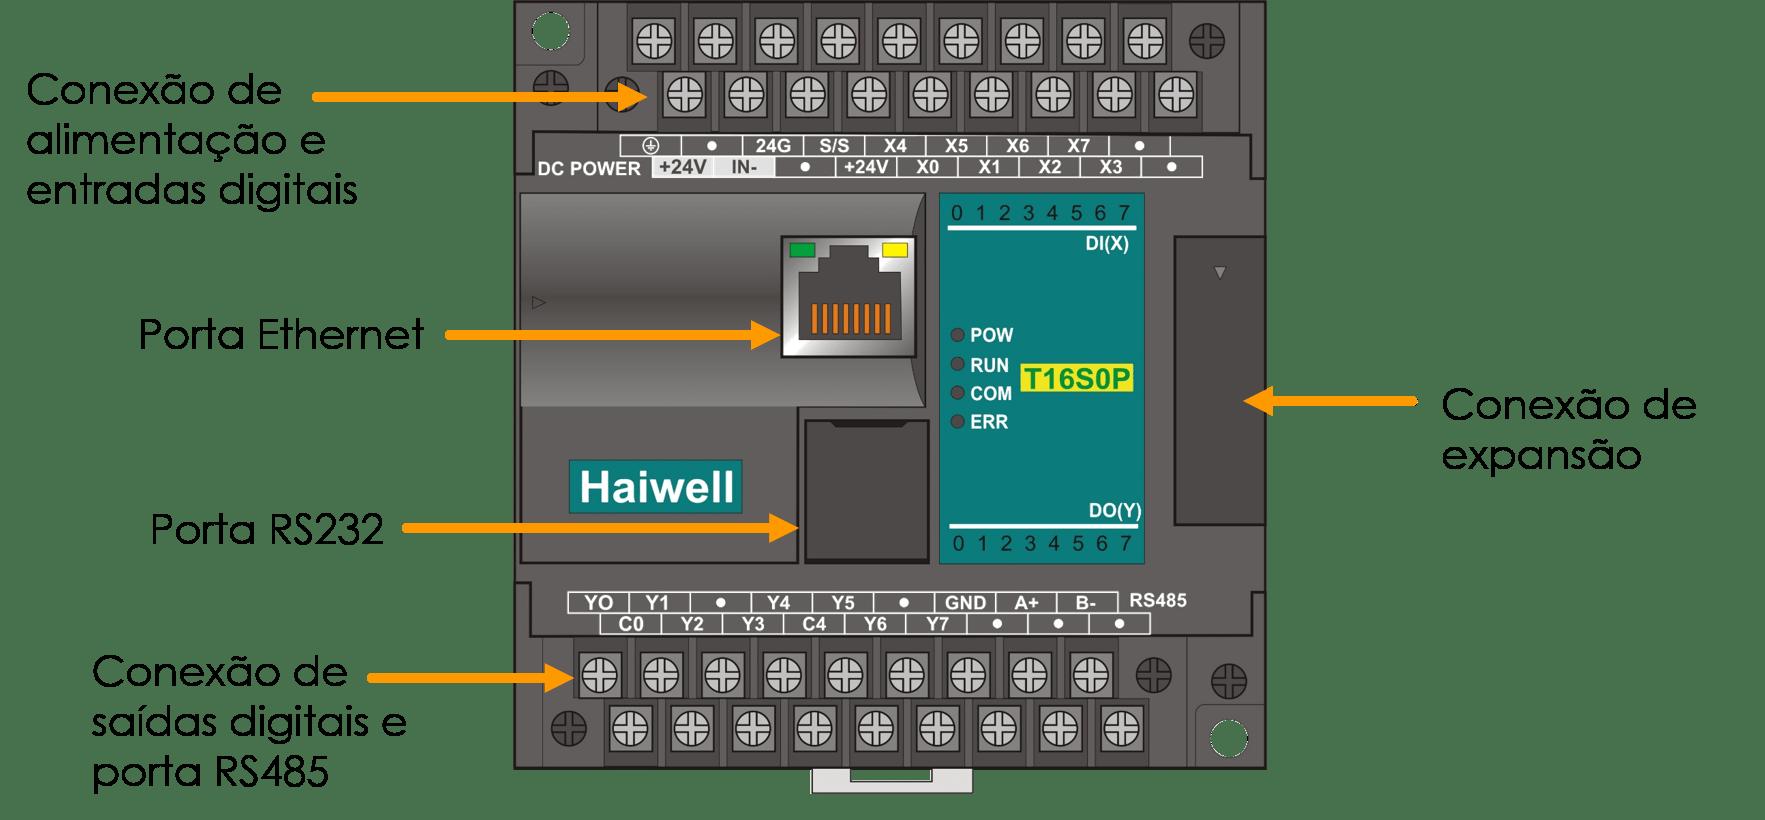 CLP - O que é - Como funciona o controlador lógico programável